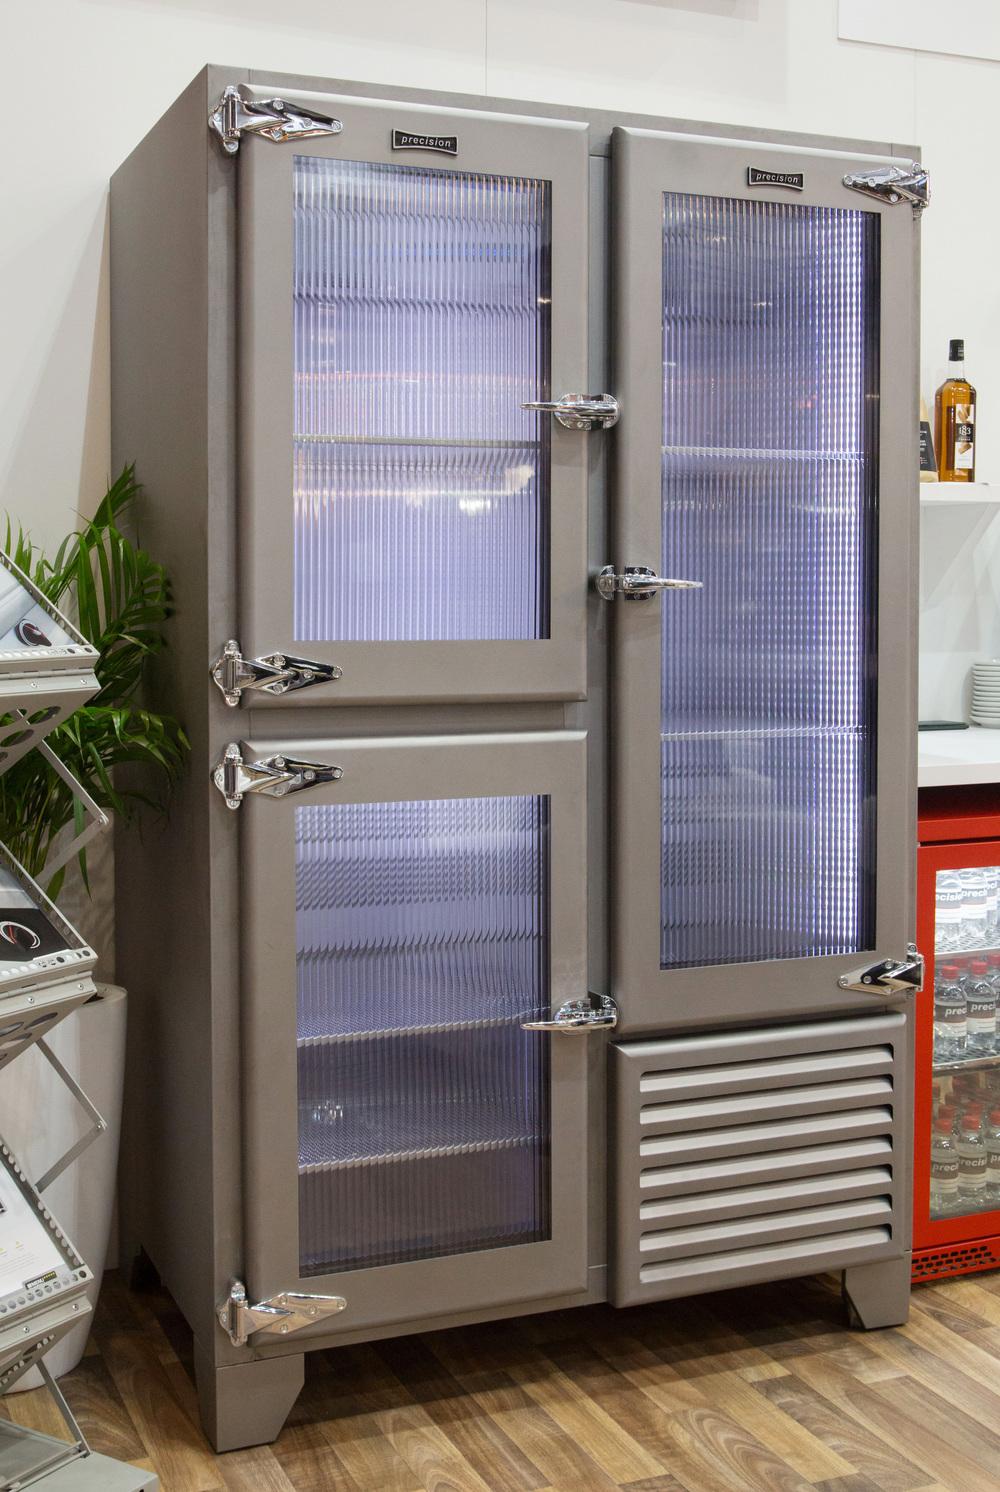 Retro Fridge With Ribbed Glass Doors